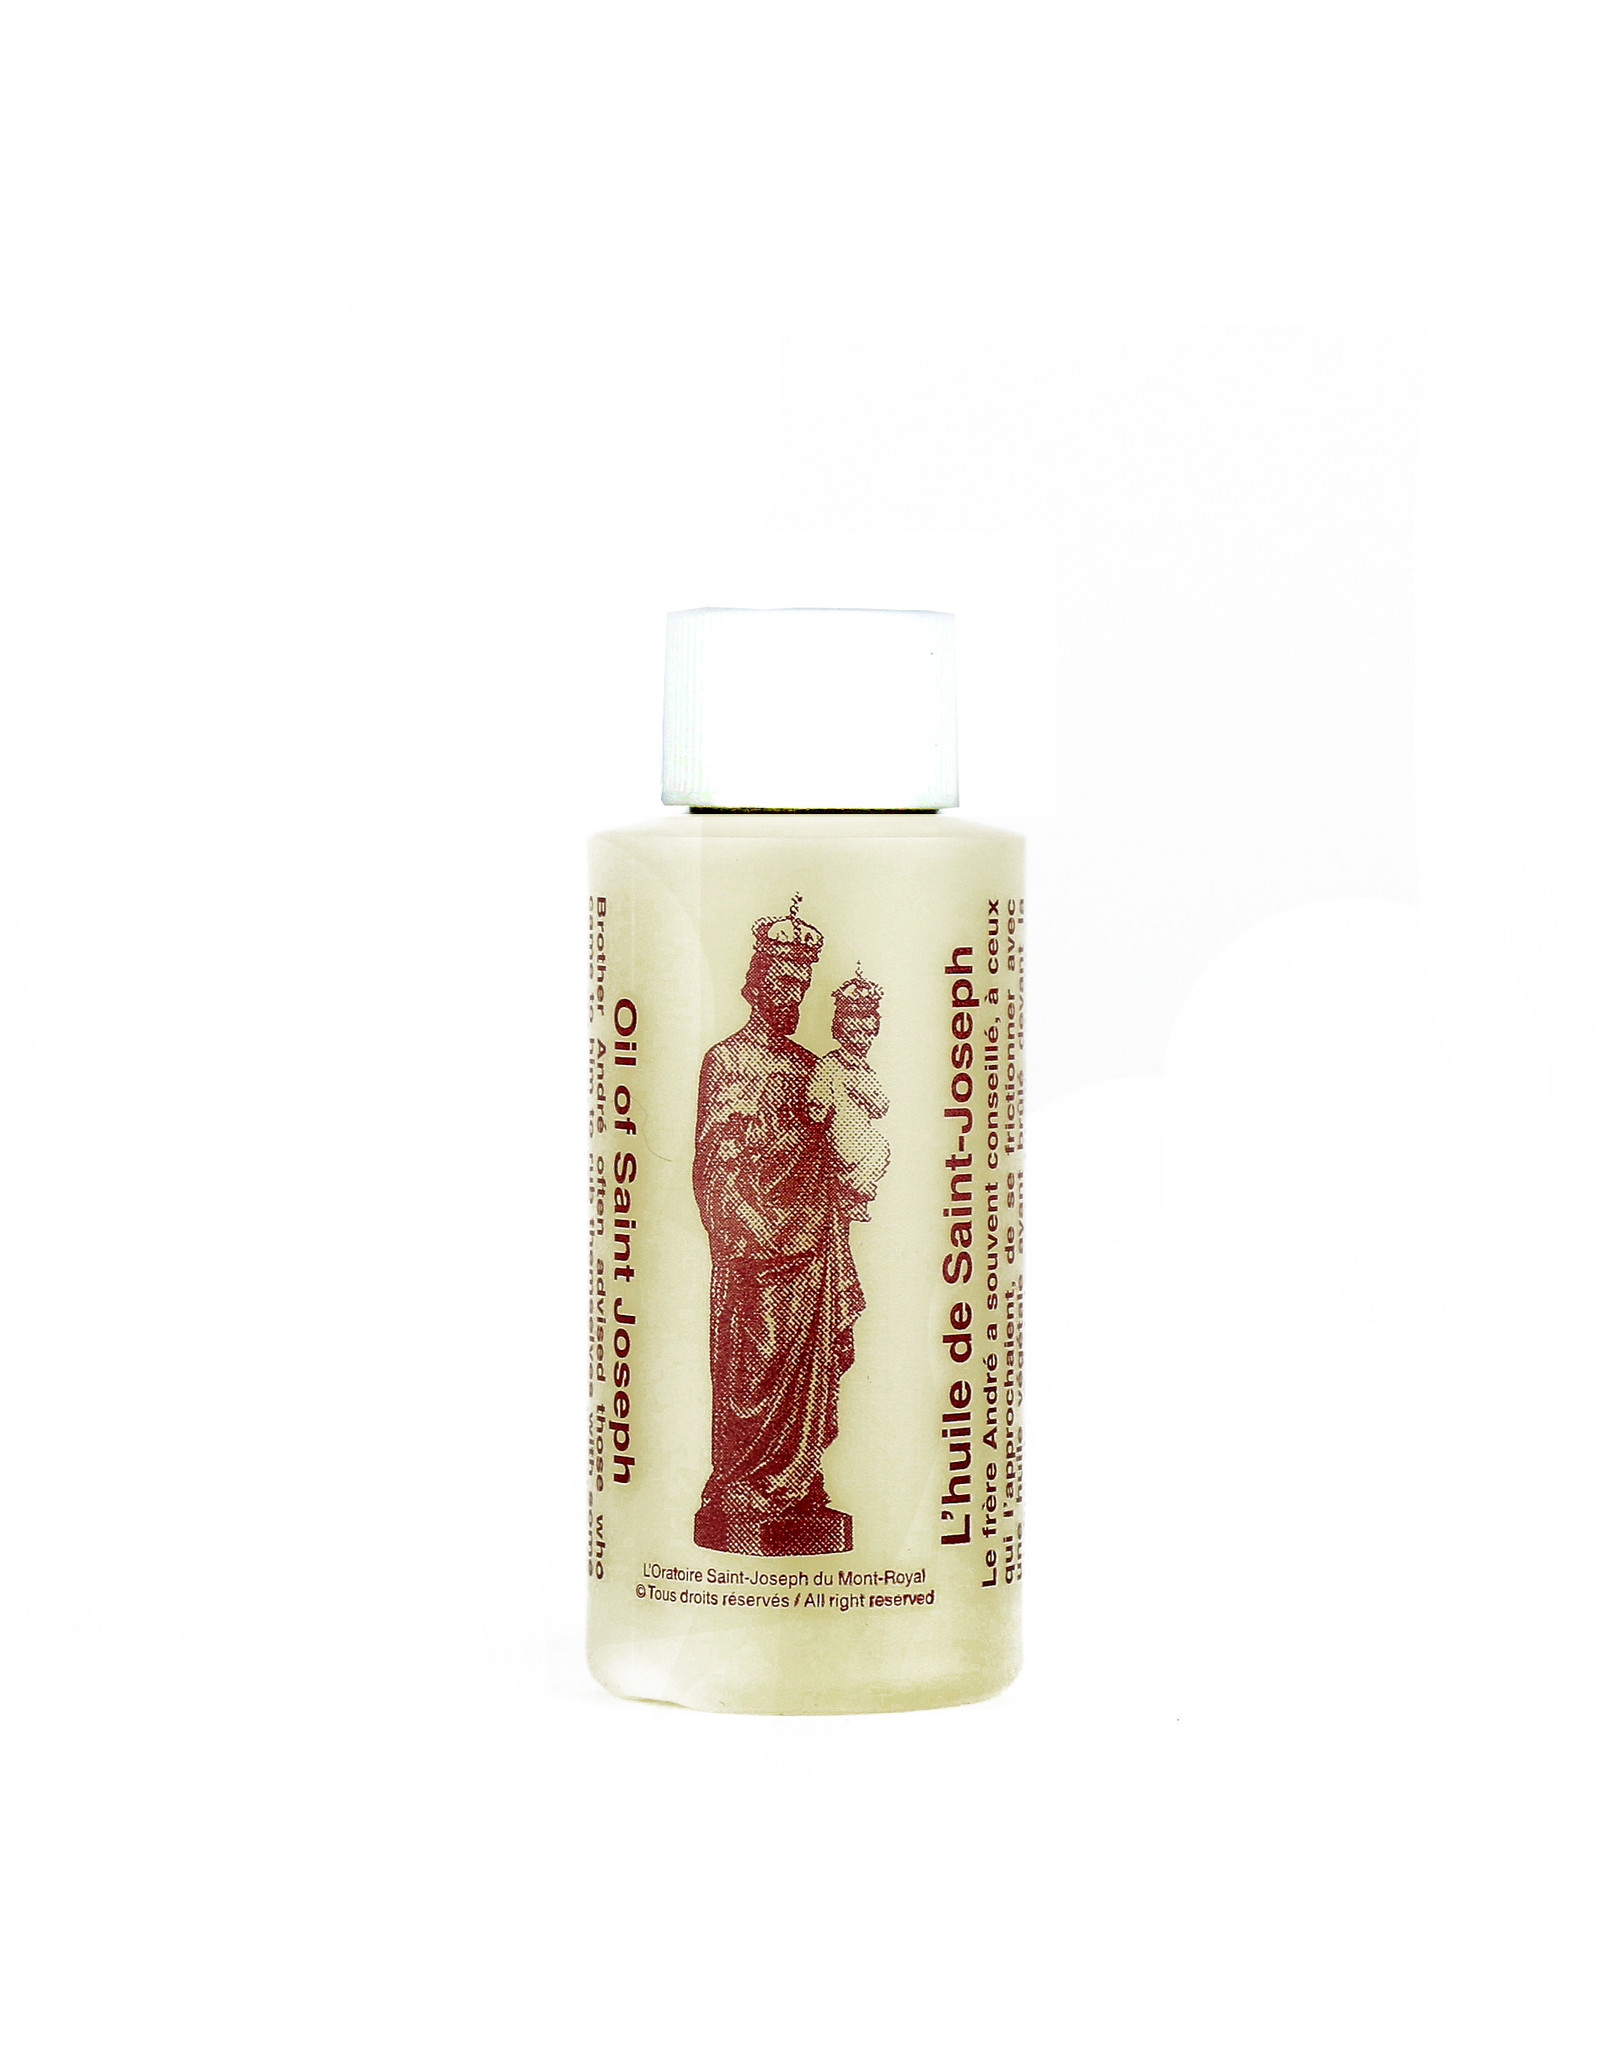 L'Oratoire Saint-Joseph du Mont-Royal Saint Joseph oil - 10 small bottles of 60 ml